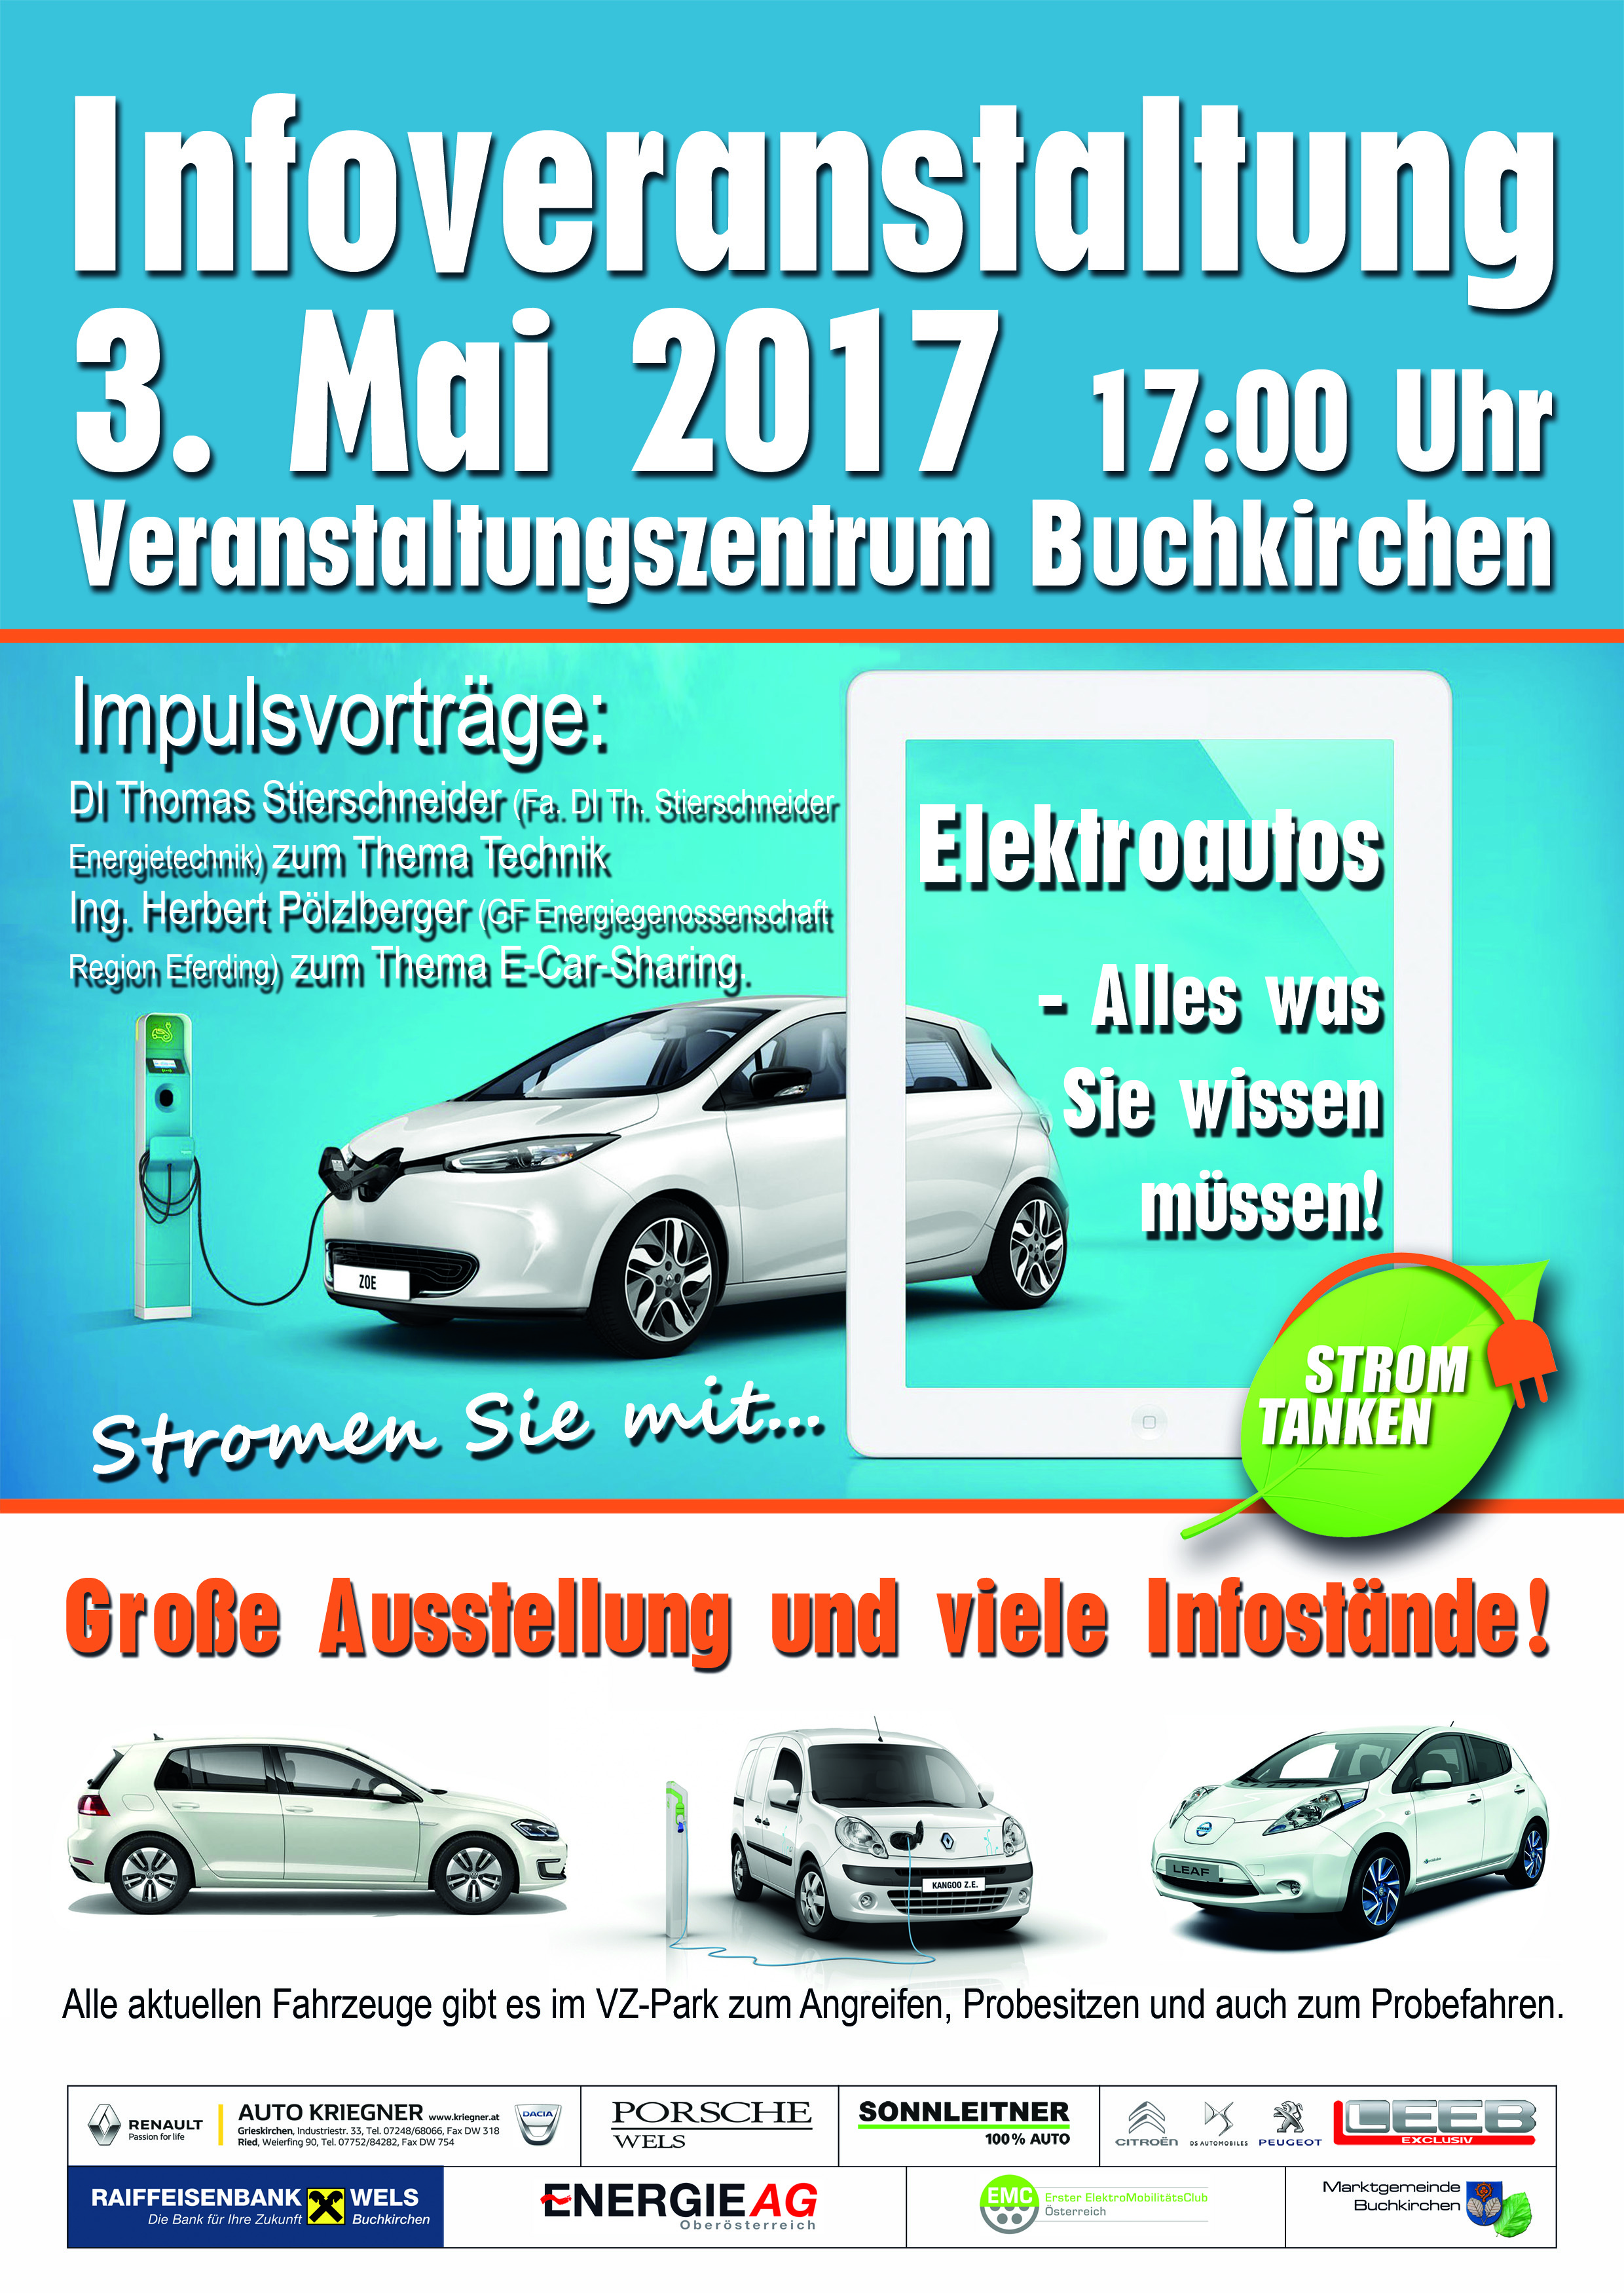 Infoveranstaltung in Buchkirchen » A4 Plakat